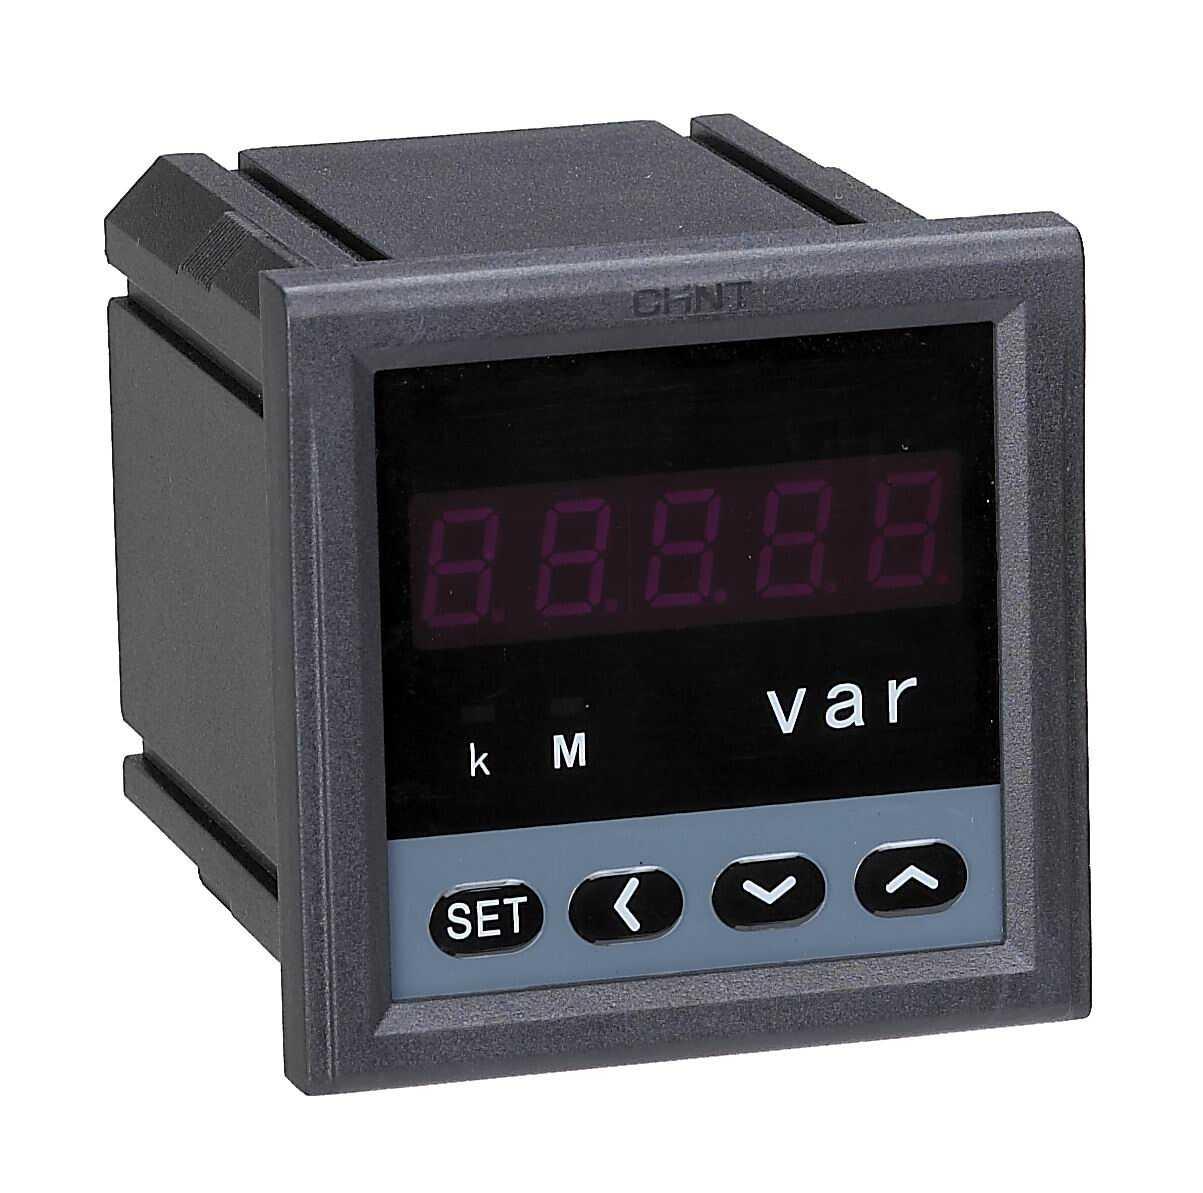 PH7777-□ series digital power factor meter